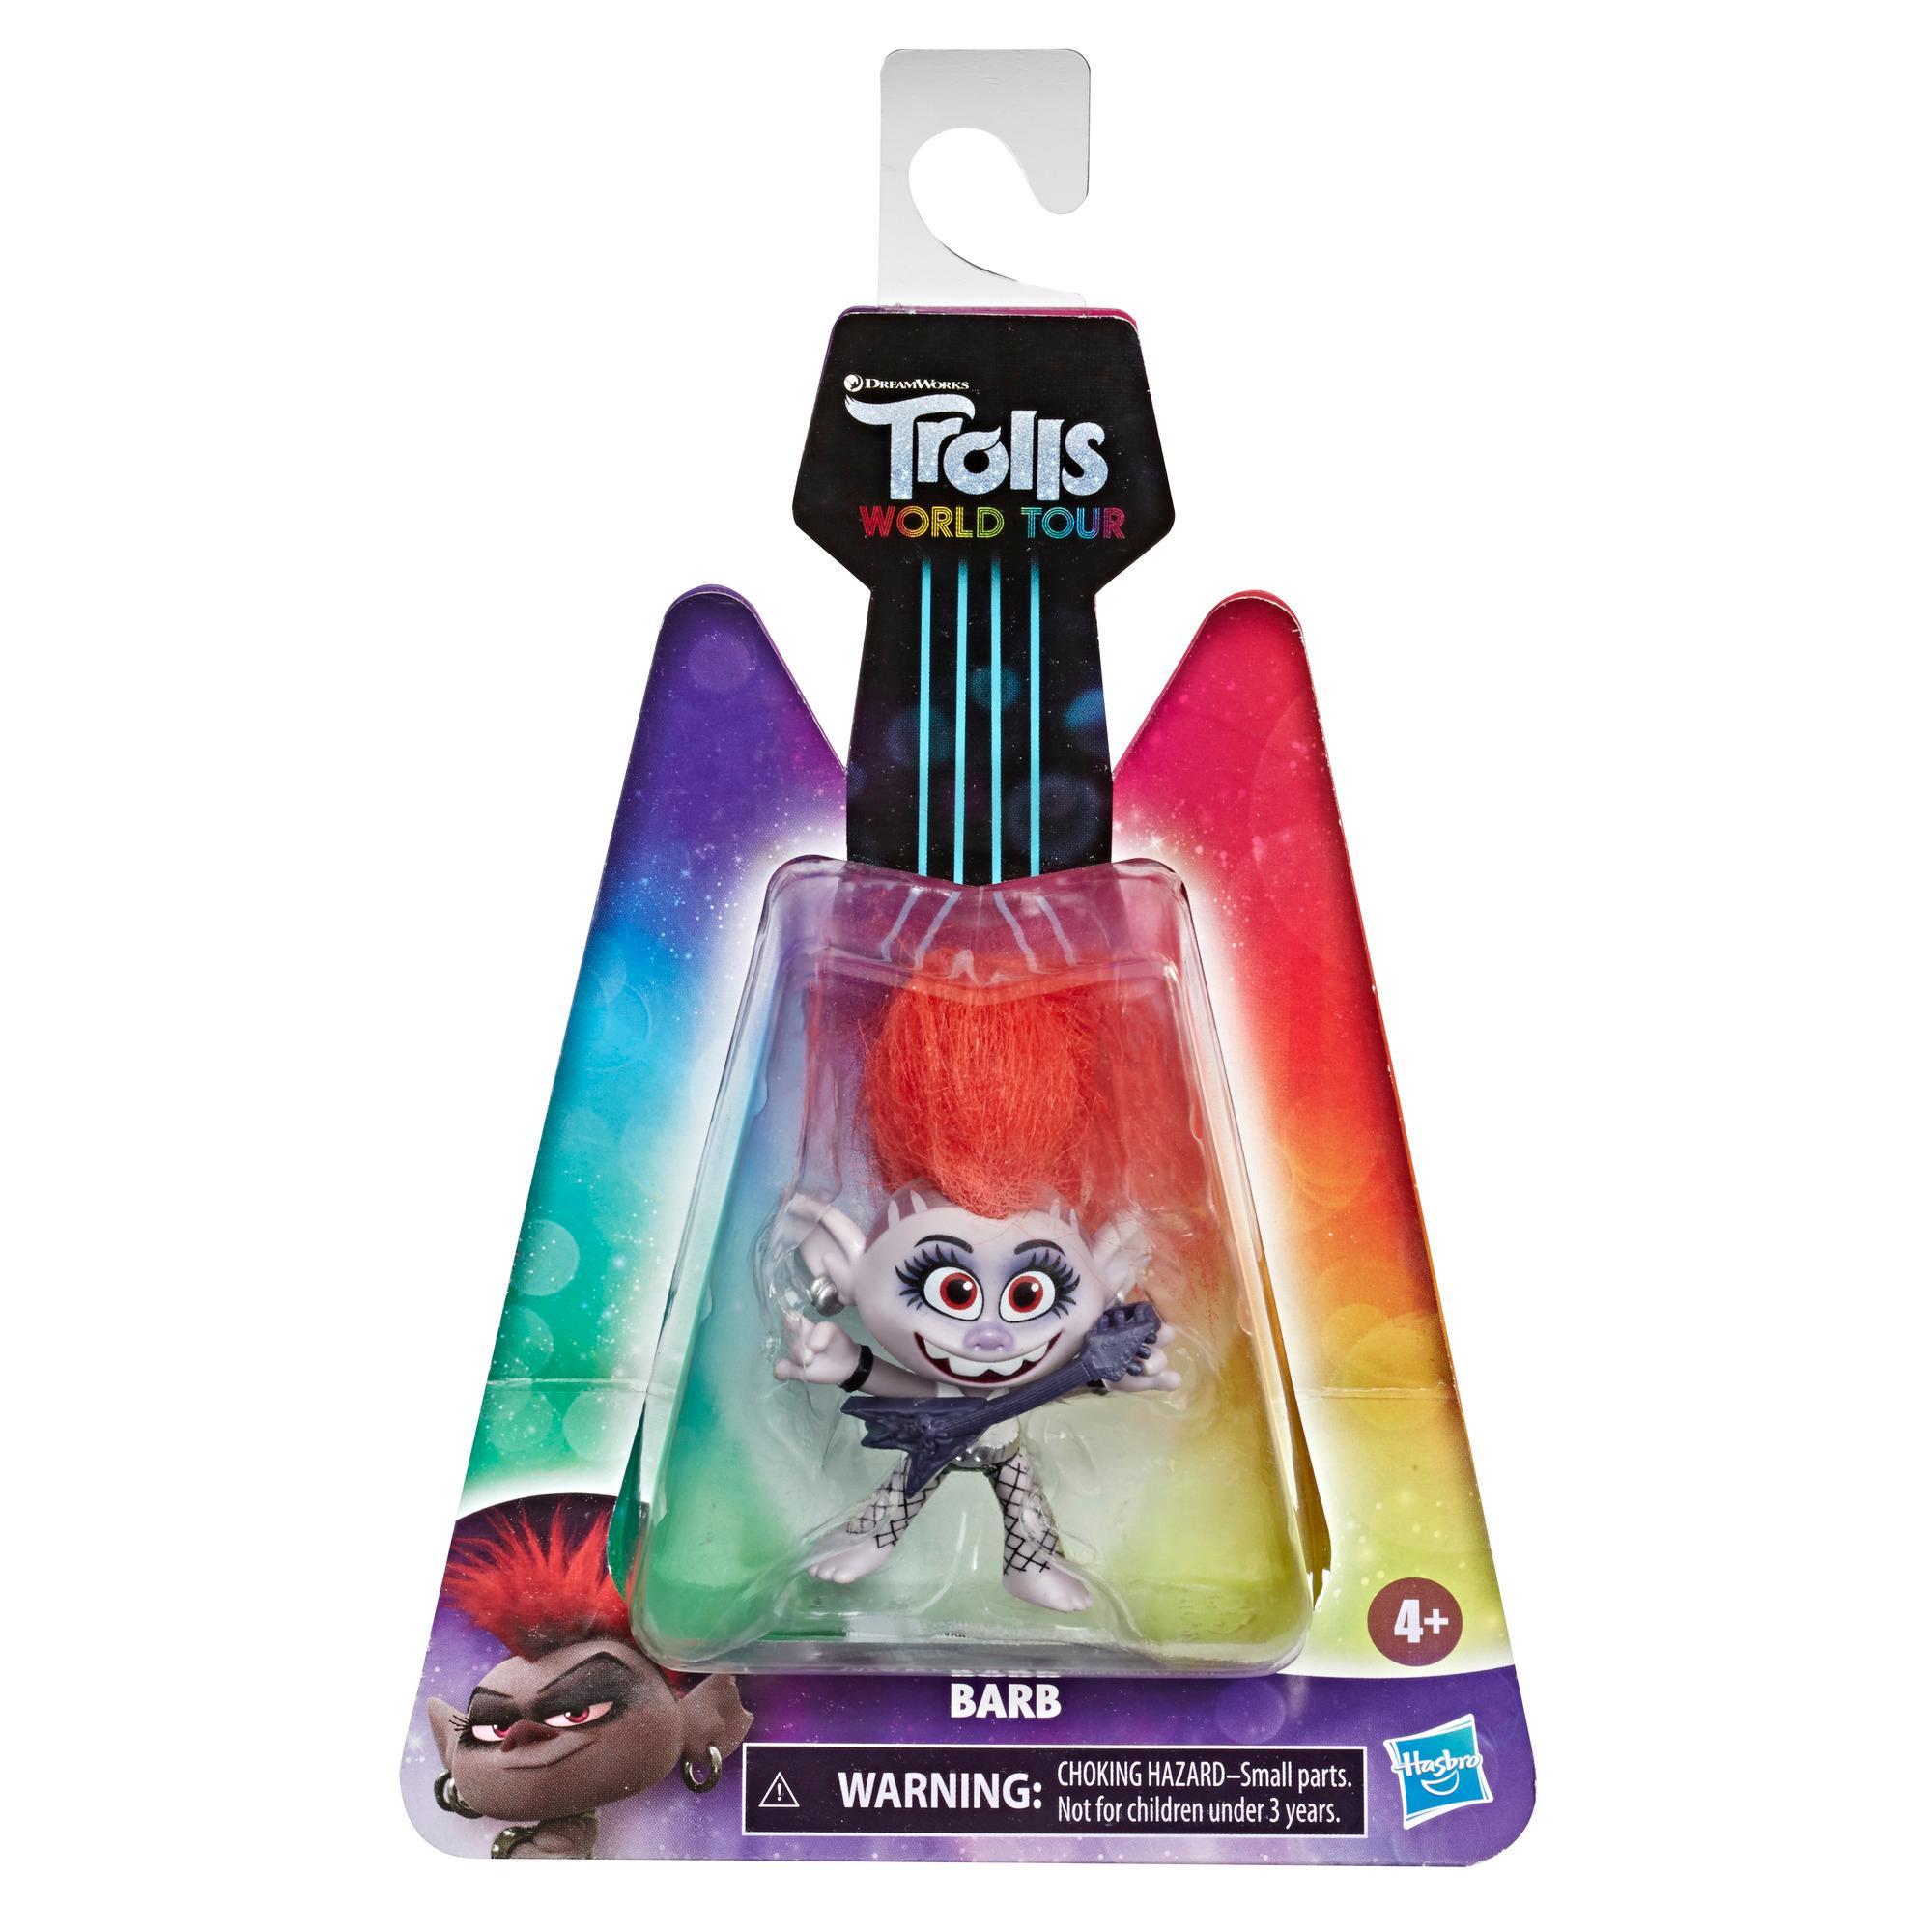 DreamWorks Trolls World Tour Barb, pop met gitaar, speeltje geïnspireerd op de film Trolls World Tour